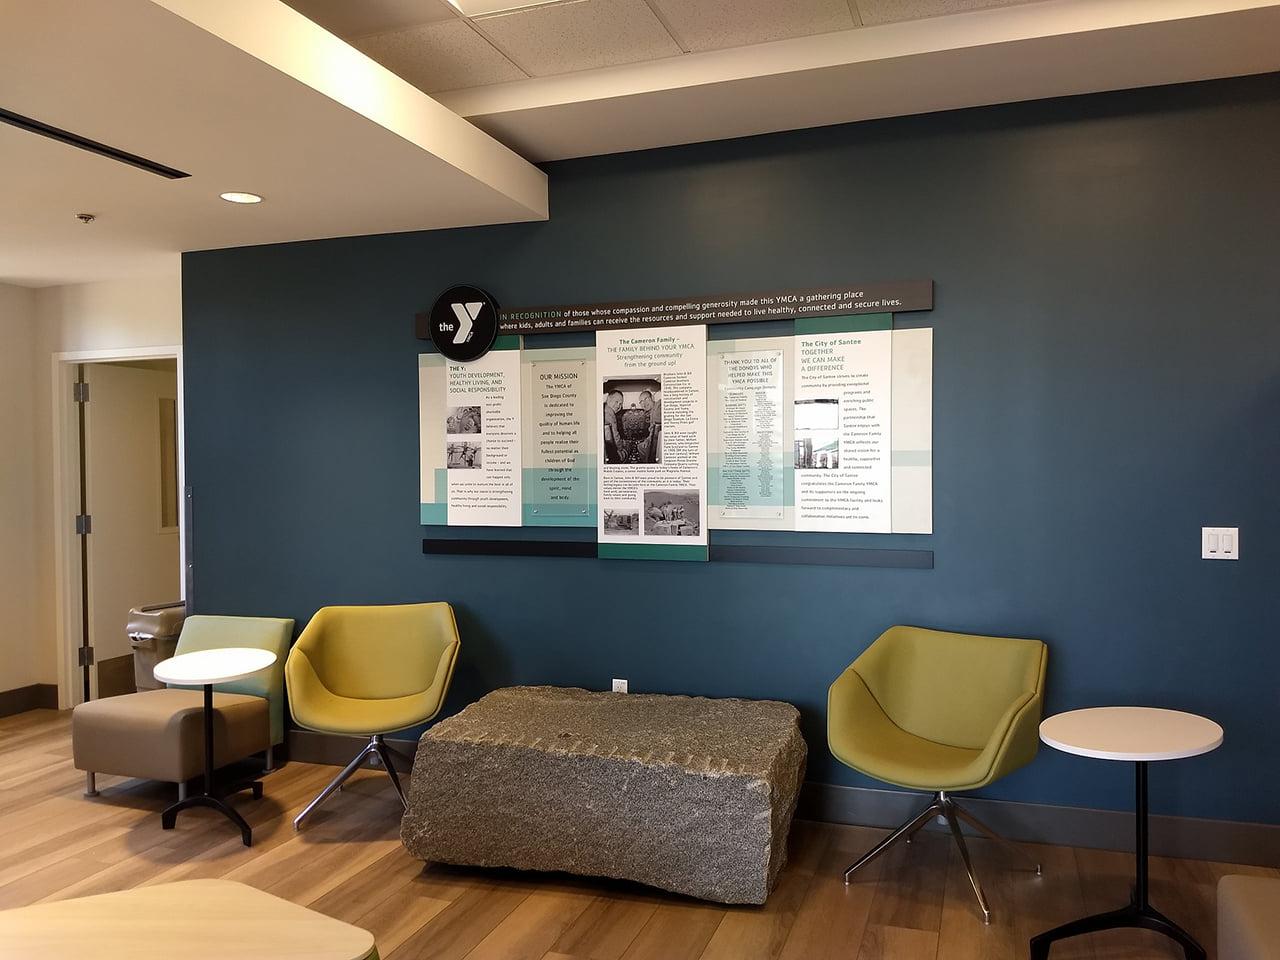 The Cameron Family YMCA history display